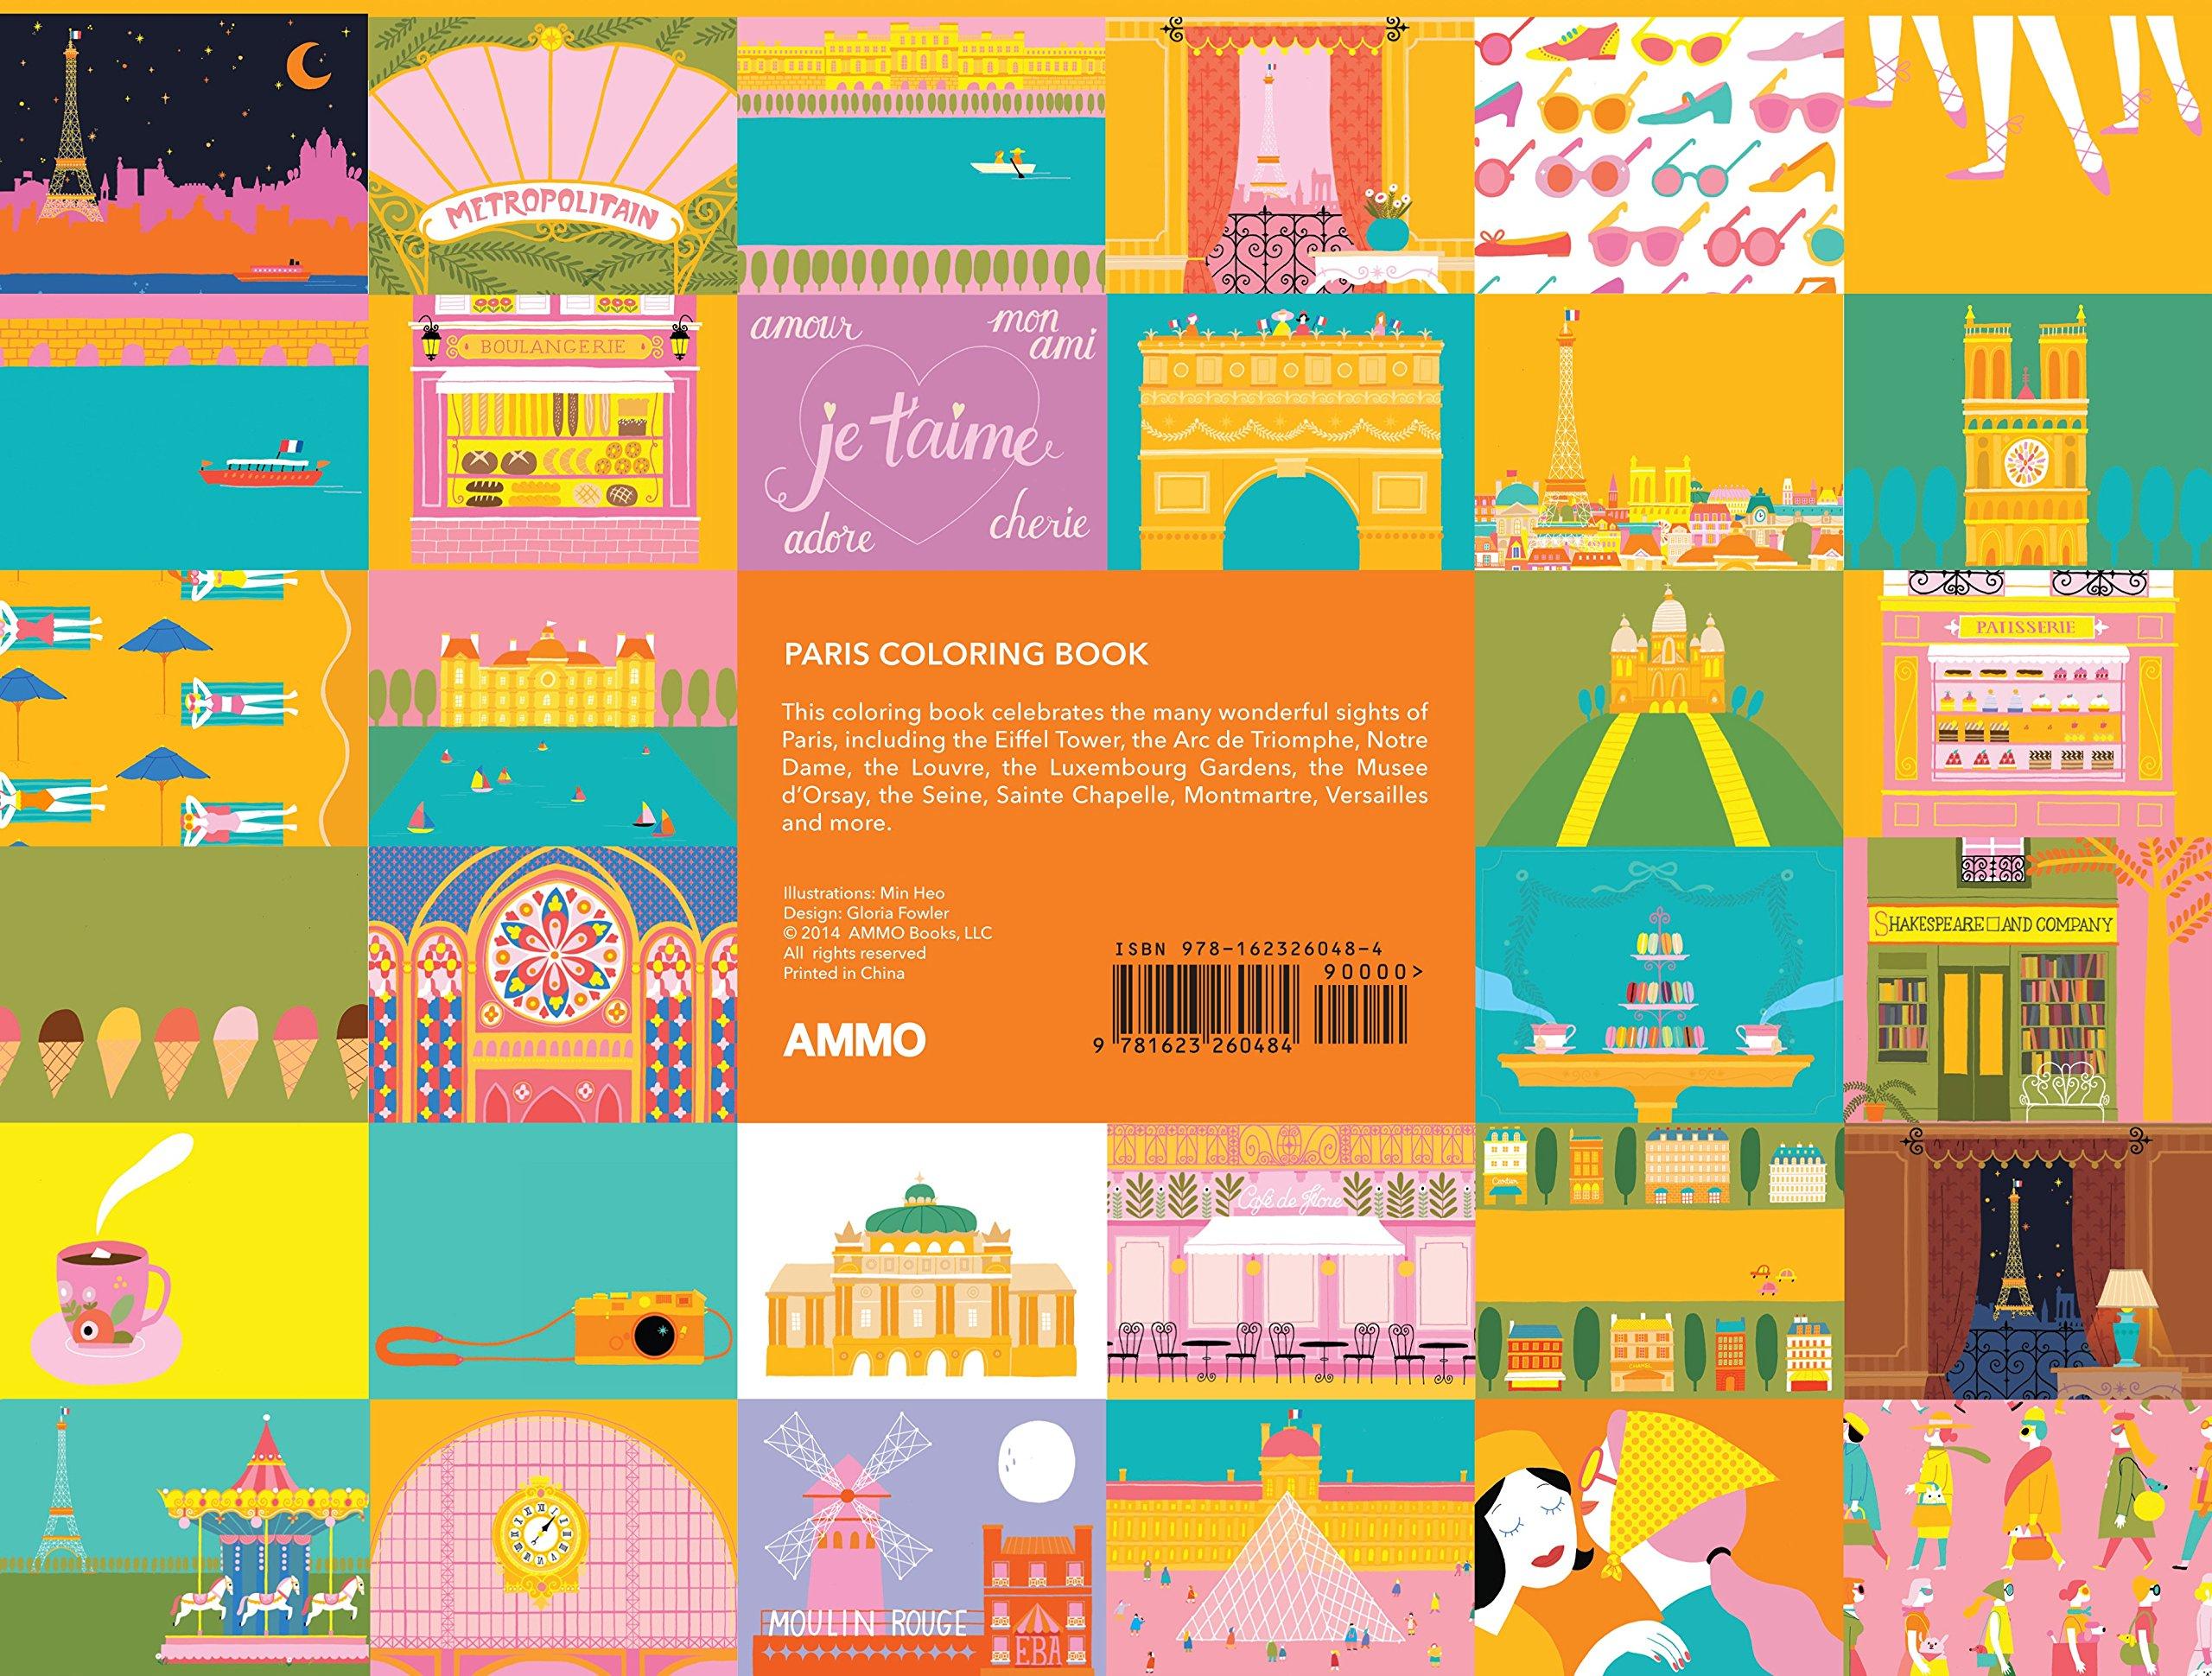 paris coloring book gloria fowler min heo 9781623260484 books amazonca - Paris Coloring Book